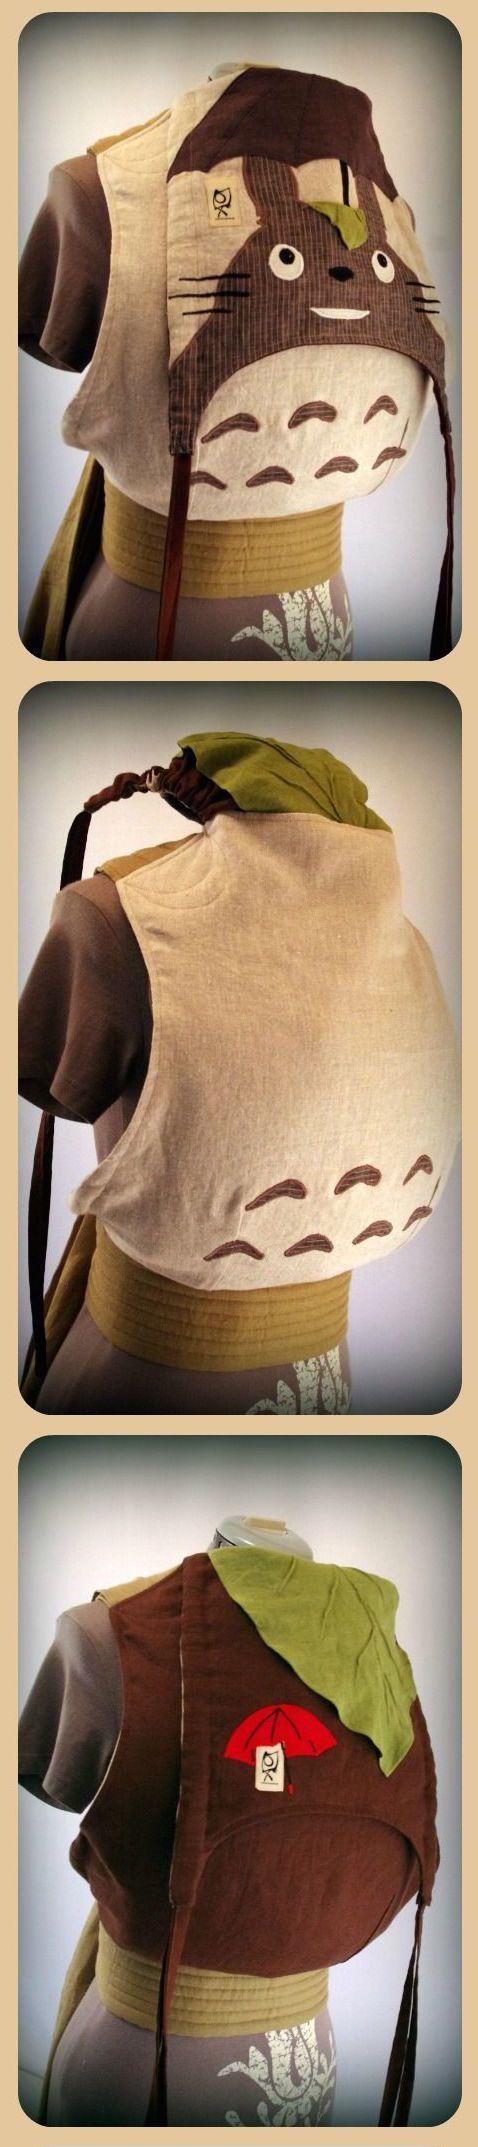 best morgans stuff images on pinterest fabric dolls animaux